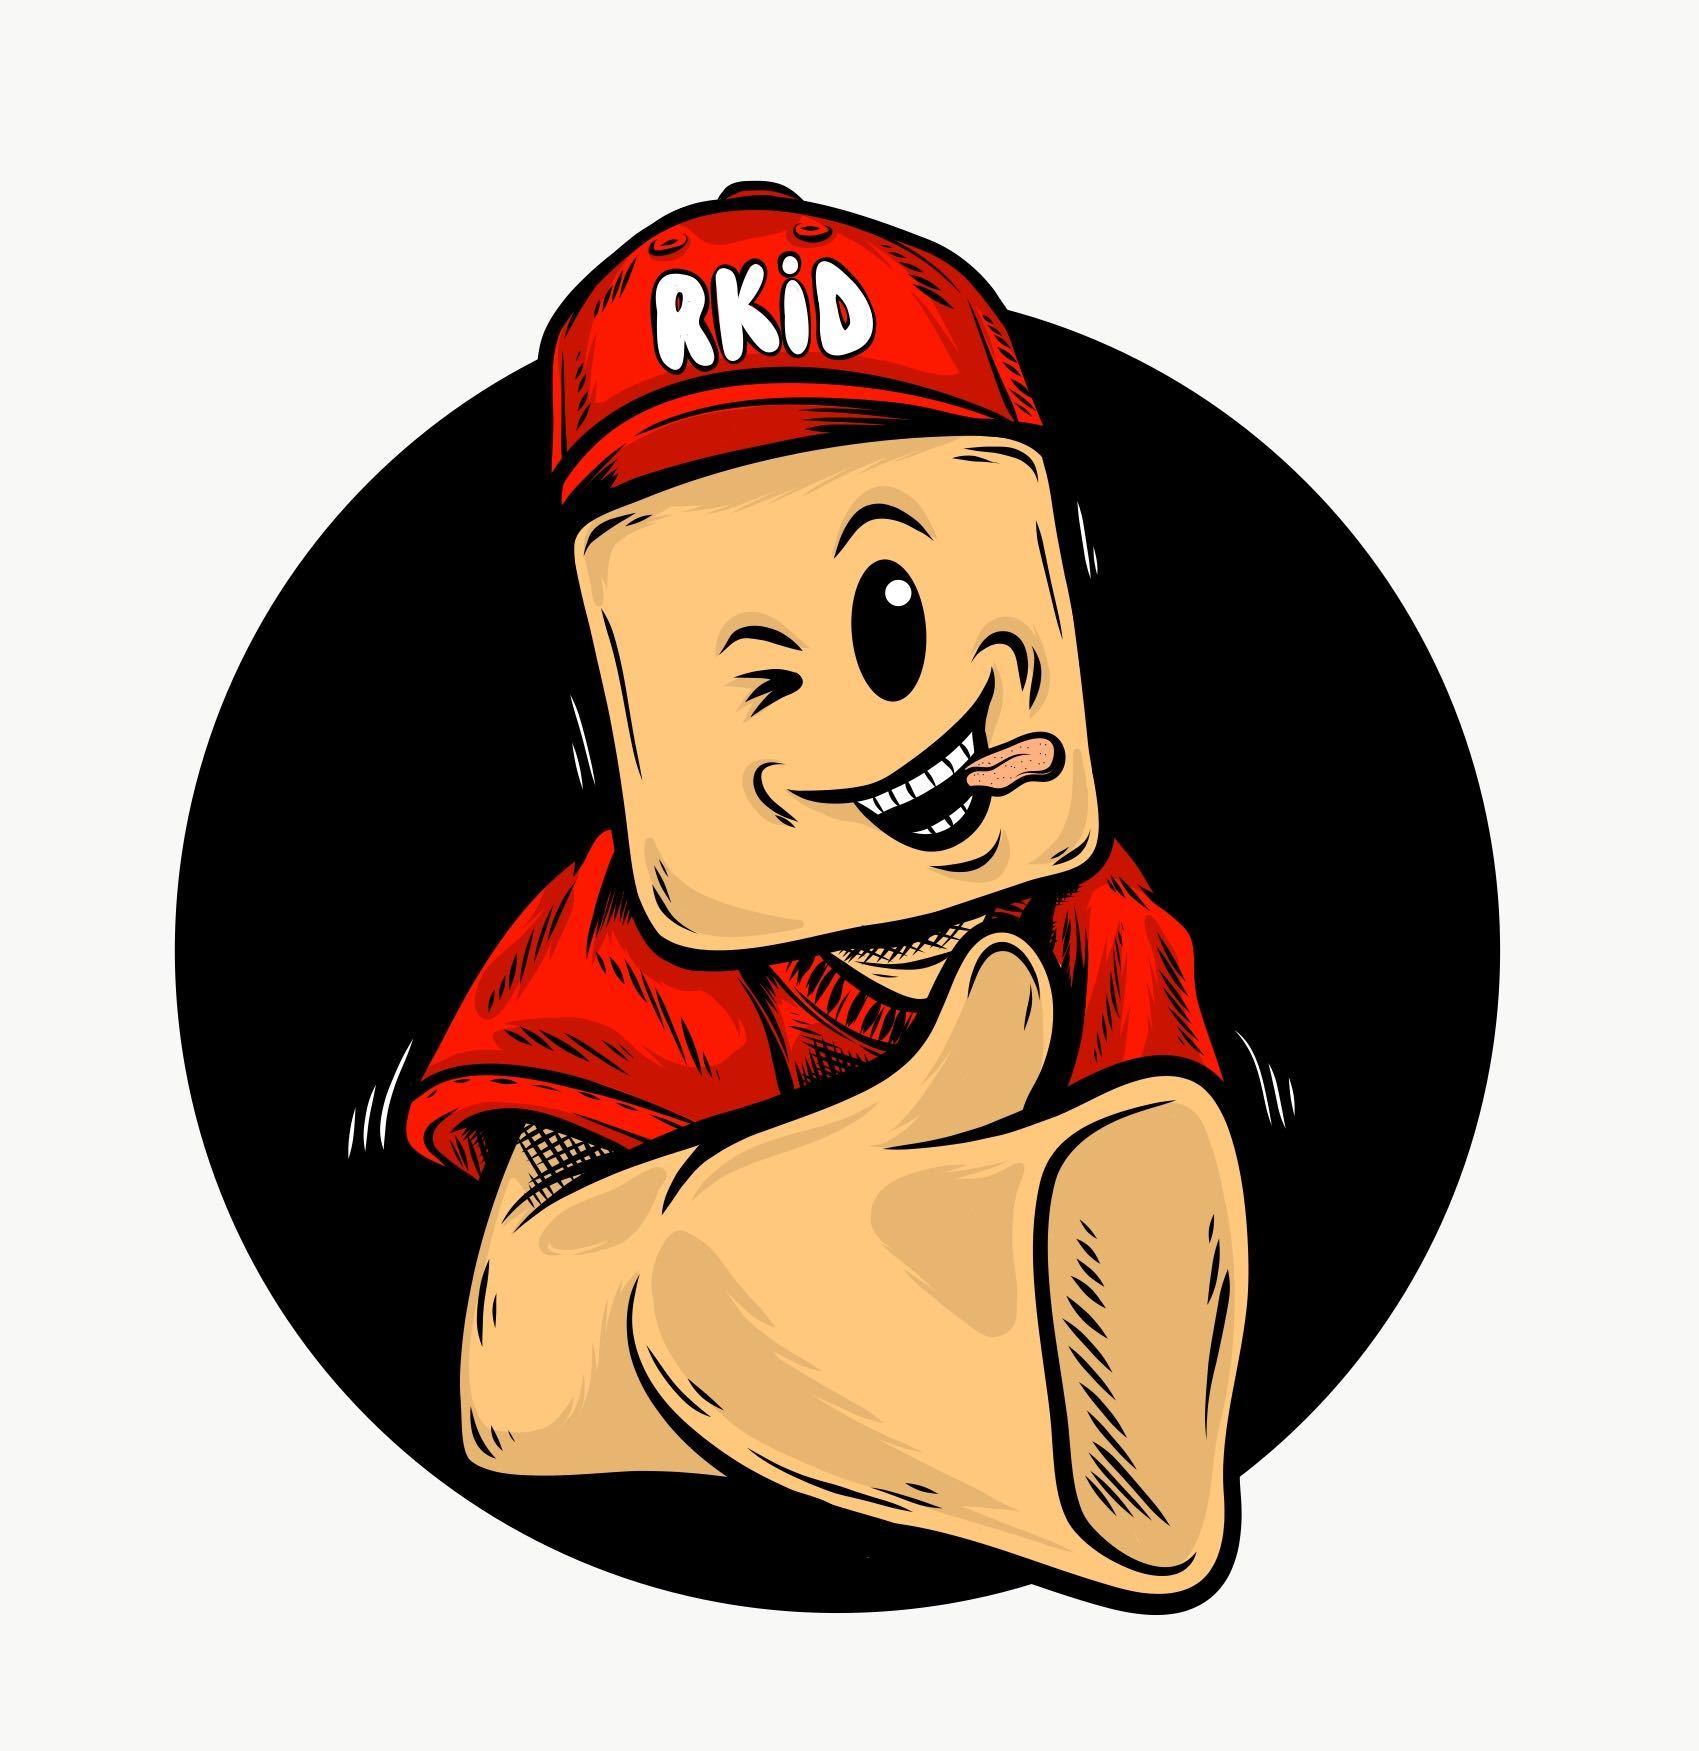 Buy Diary Of A Roblox Deadpool High School Roblox Deadpool - Robloxia Kid Audio Books Best Sellers Author Bio Audible Com